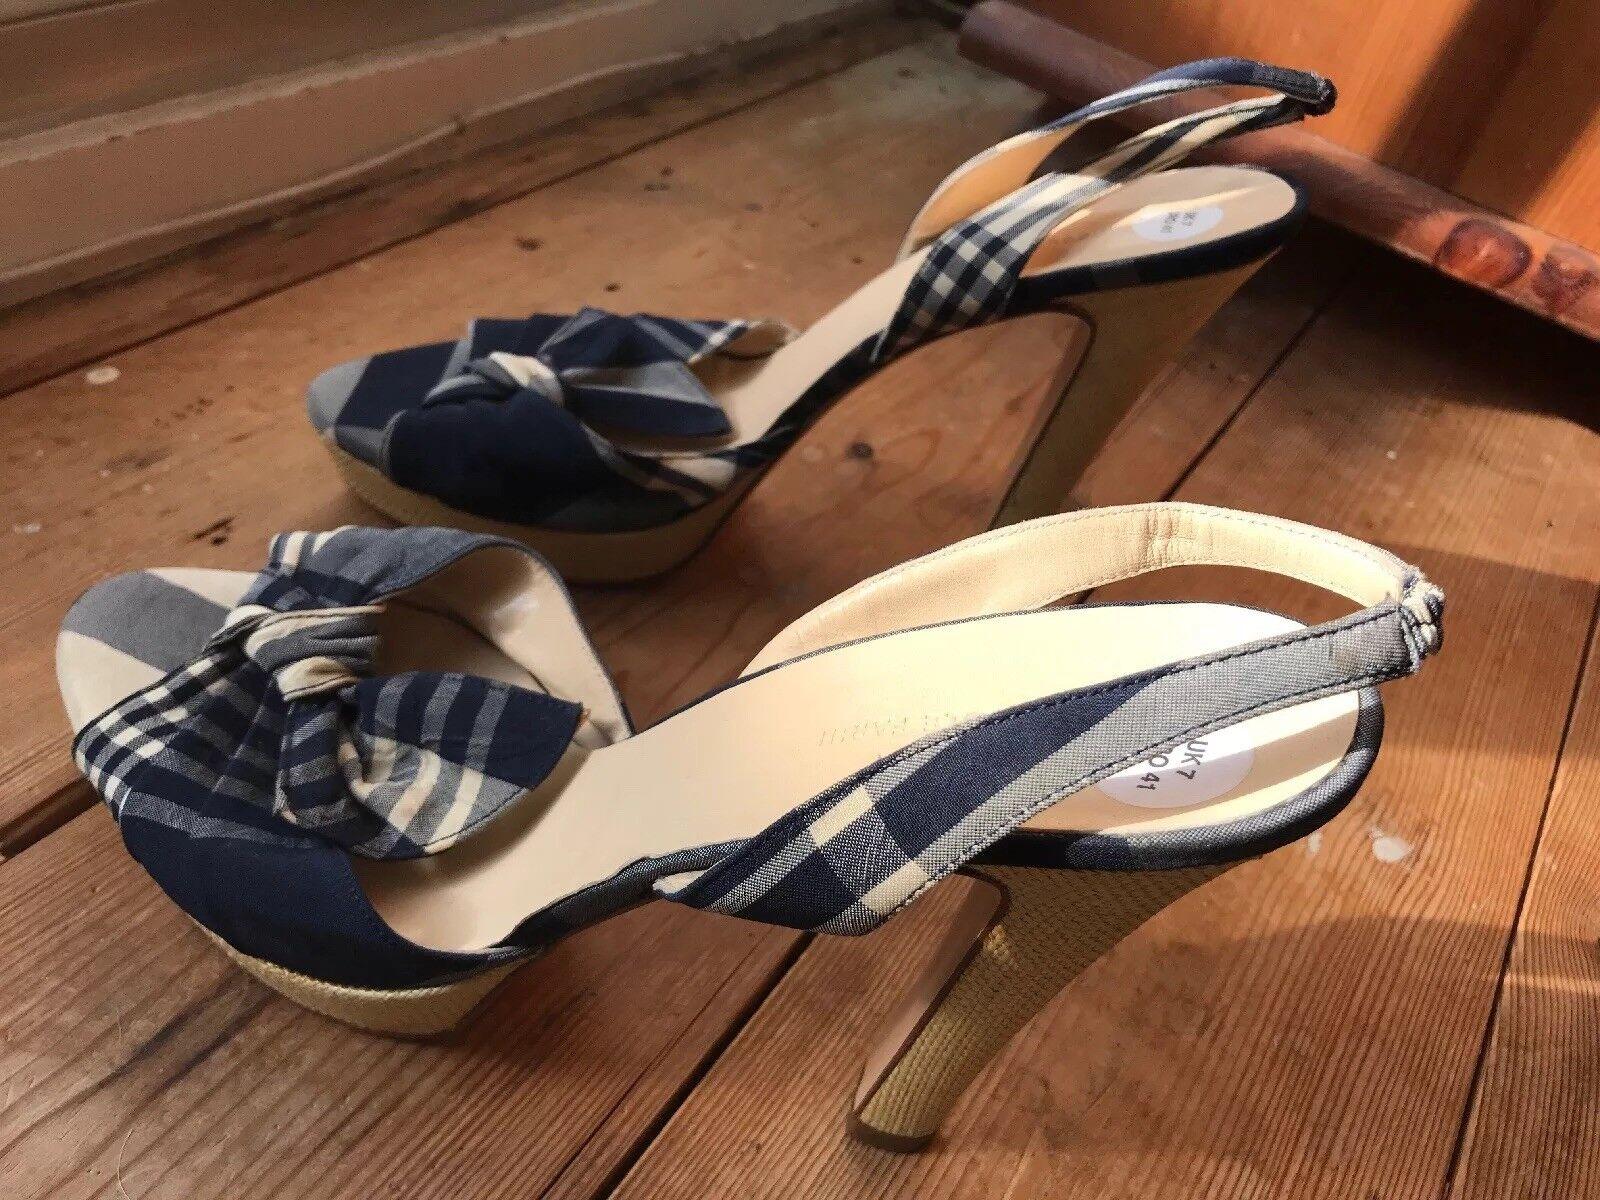 Sexy NICOLE NICOLE NICOLE FARHI Blau Weiß Gingham Peep Toe Sling Back Stiletto Heel UK7 EU41 303033